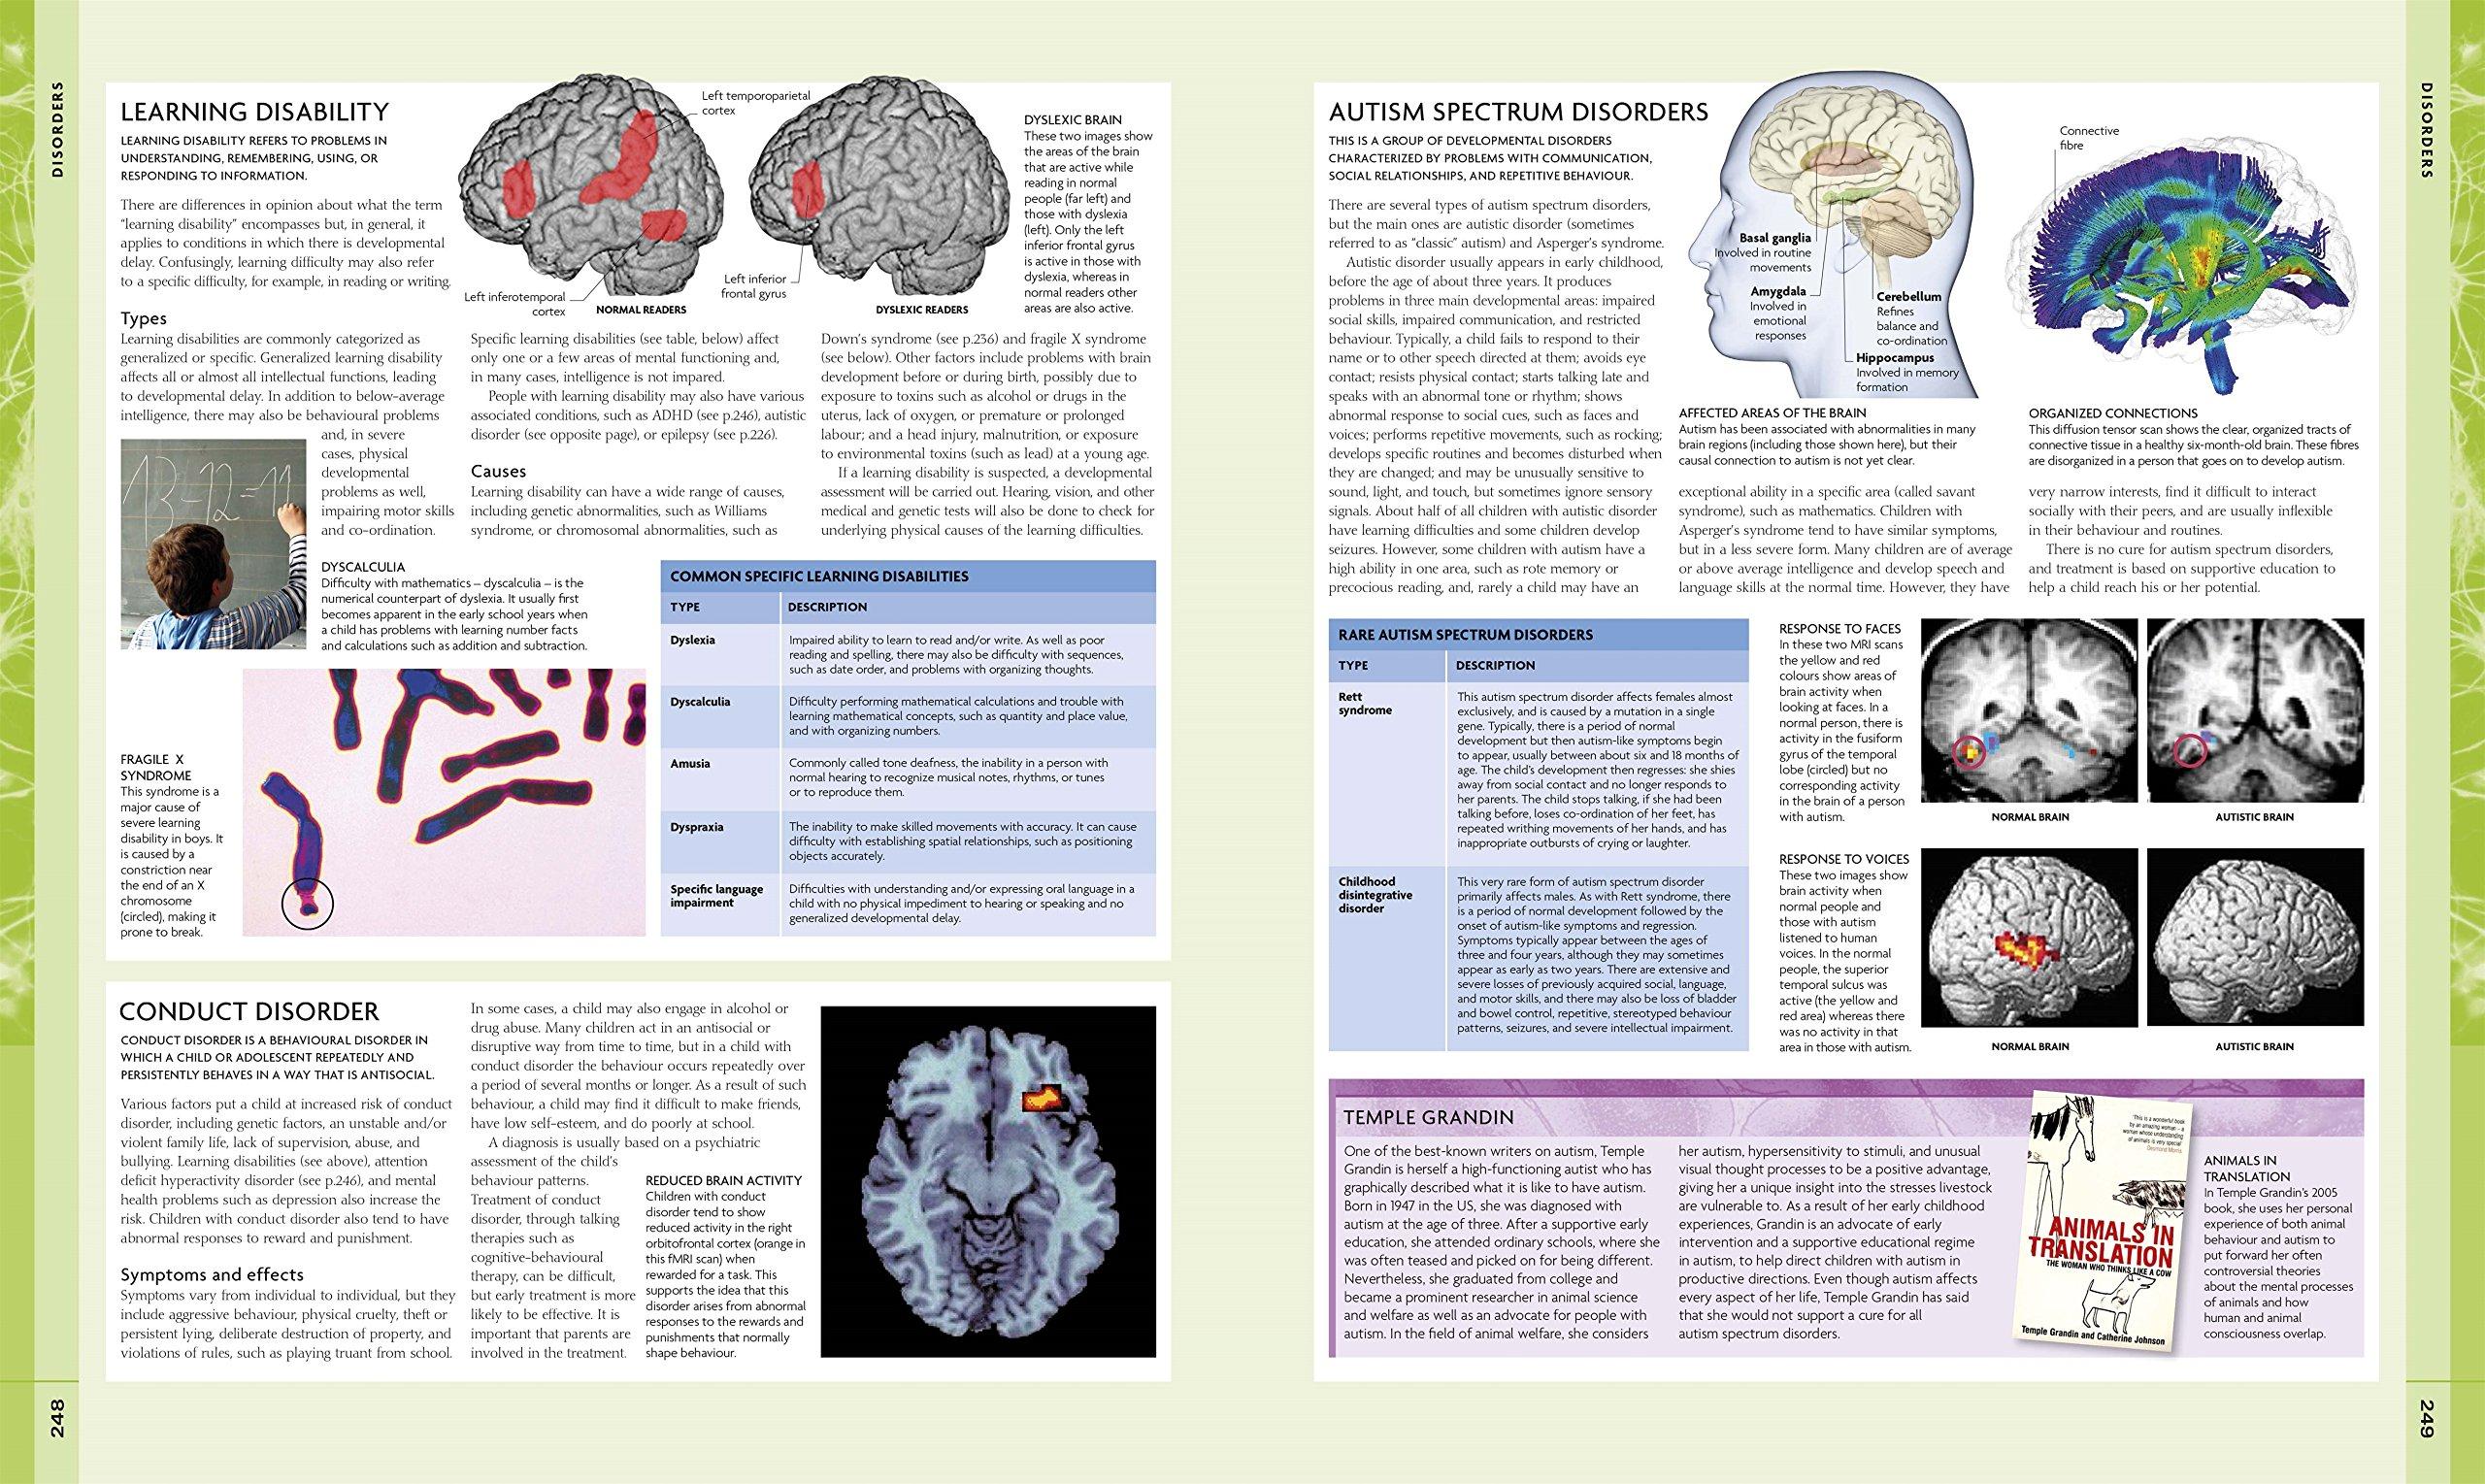 The human brain coloring book diamond - The Human Brain Coloring Book Diamond 29